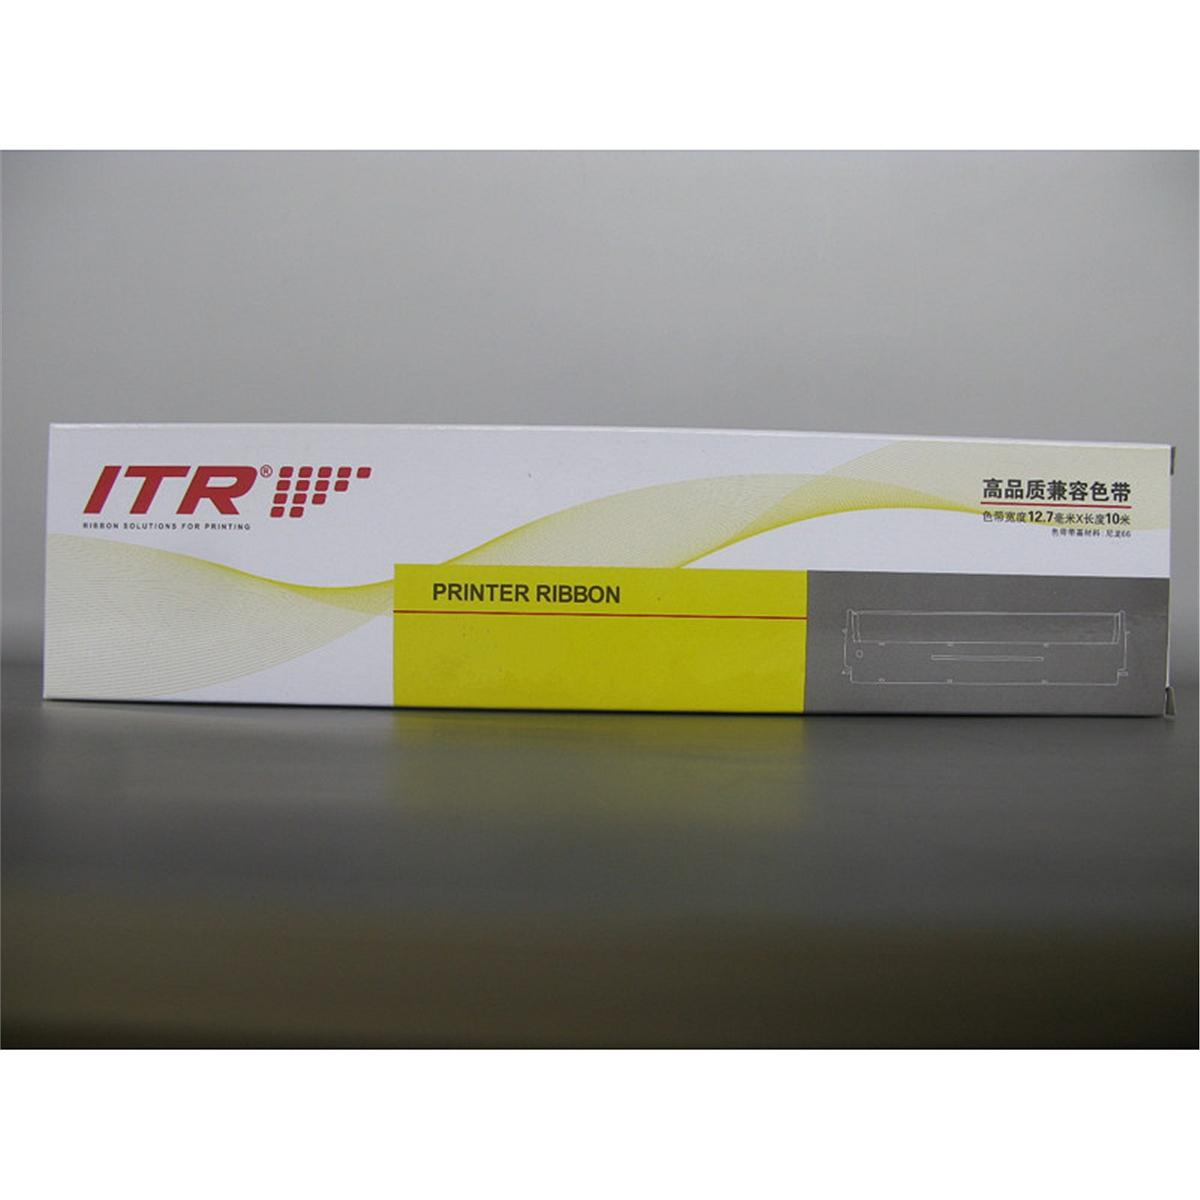 ITR-DS2000 兼容色带芯 低端 (单位:支)